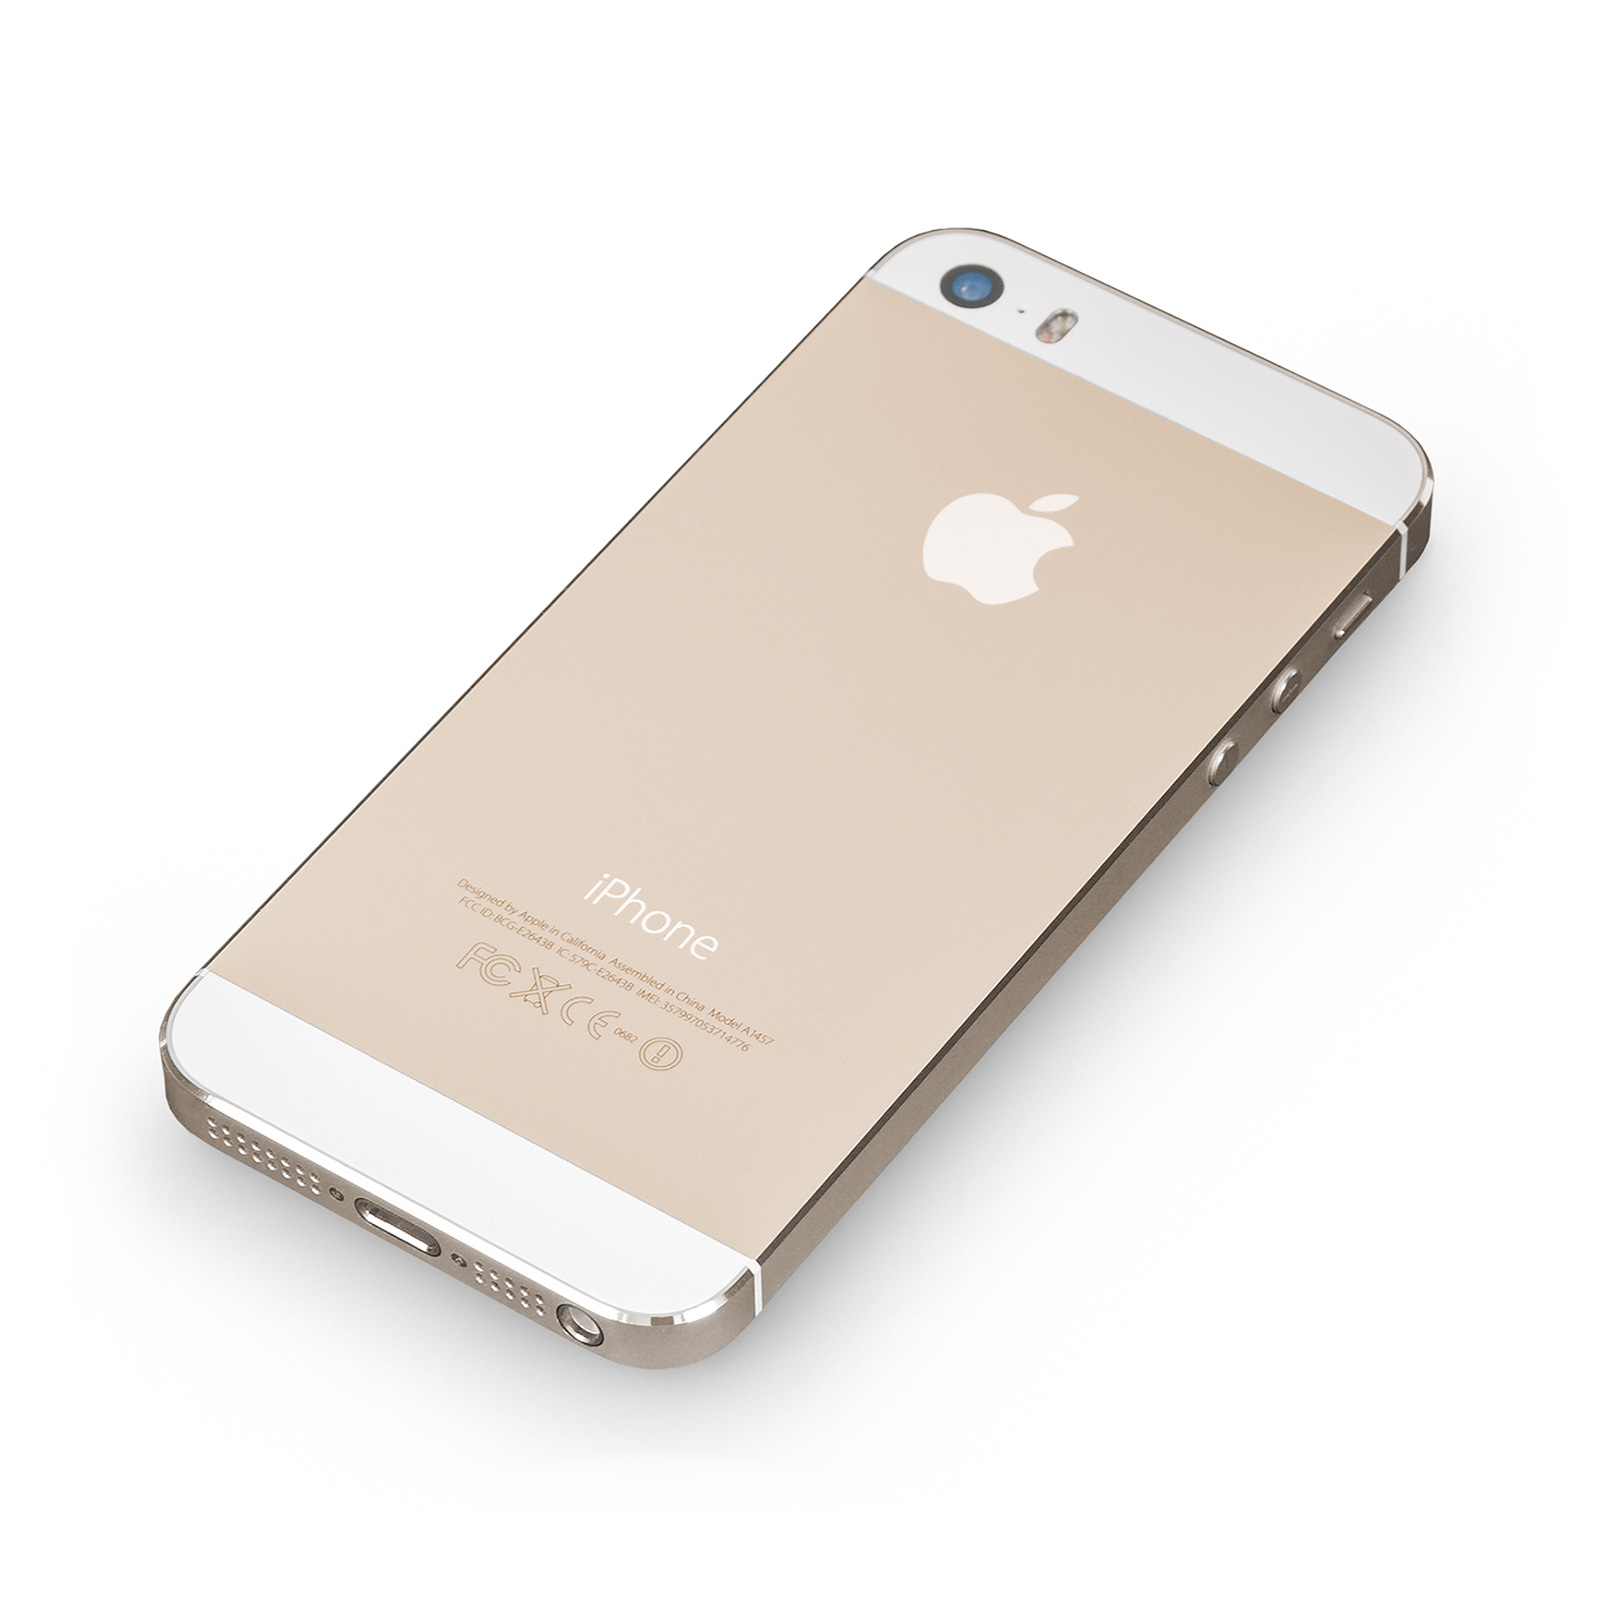 Iphone S Gold Gb Neu Ohne Vertrag